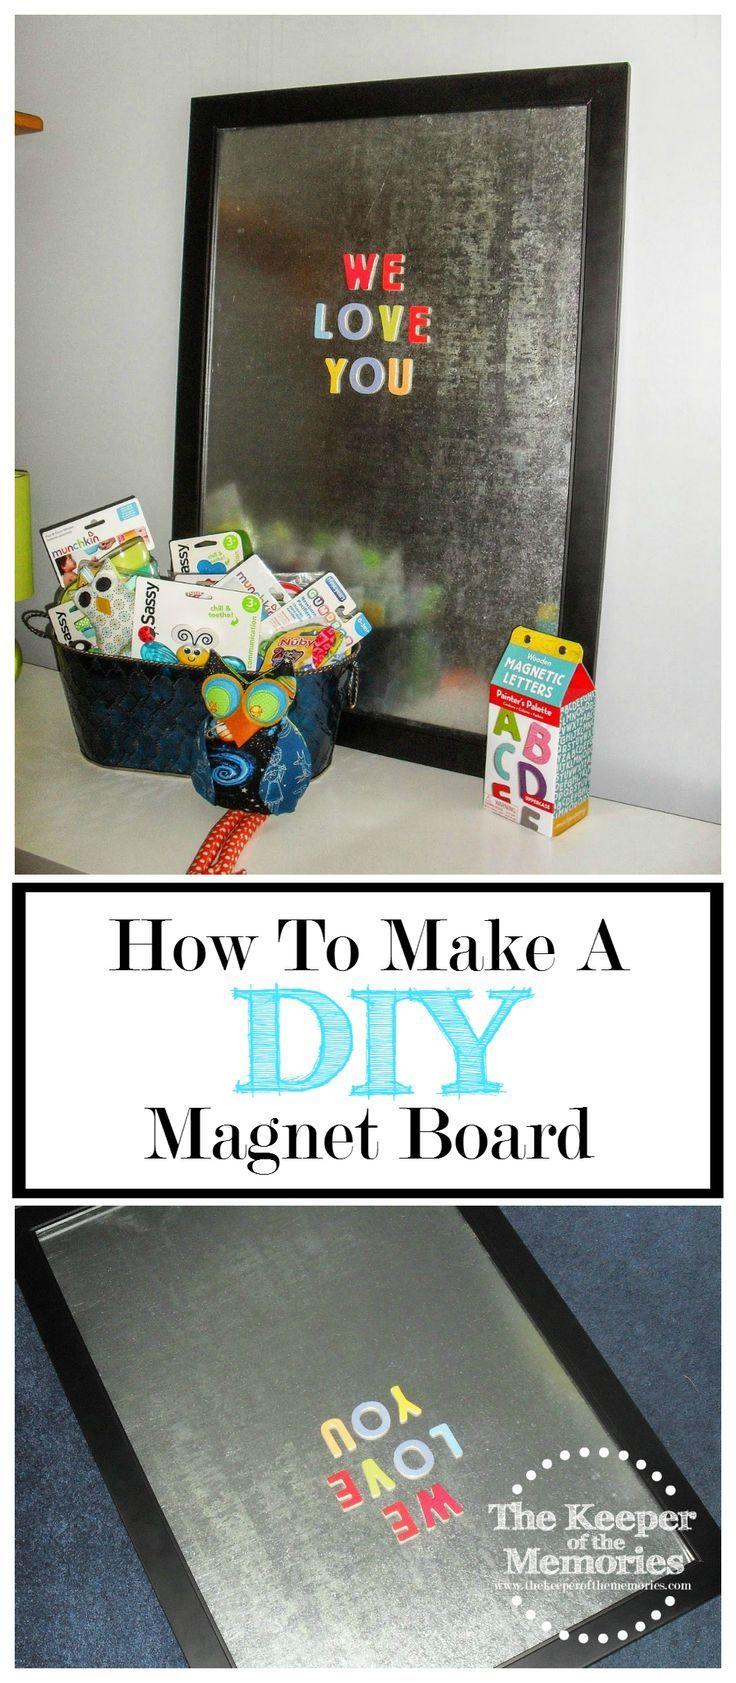 25+ unique Diy magnetic board ideas on Pinterest ...